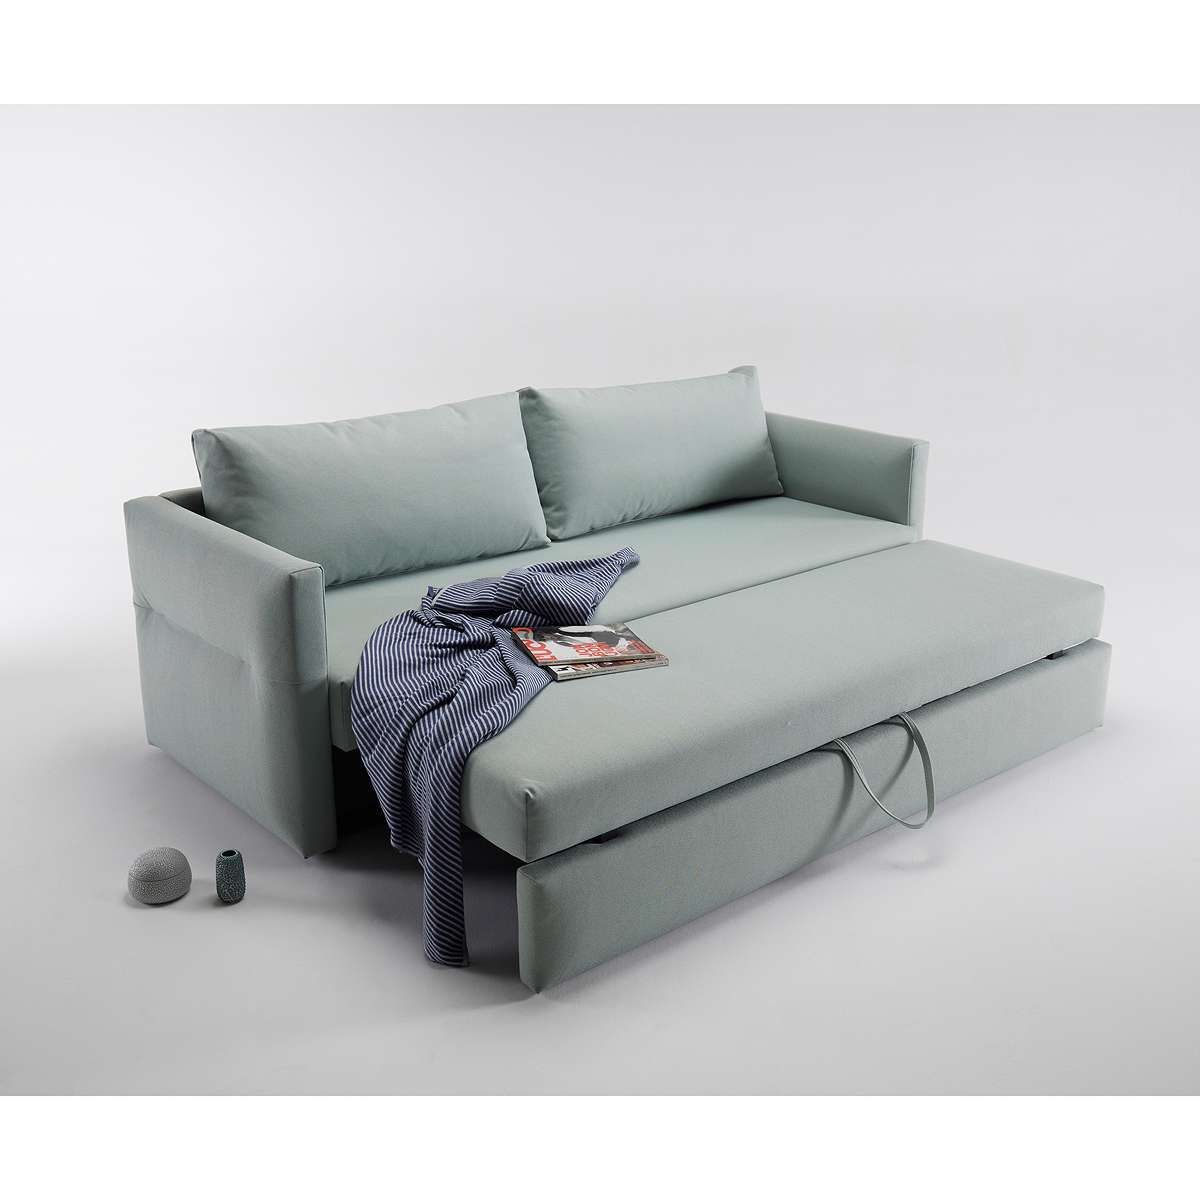 Toke Sofa By Innovation Usa Smart Furniture Cheap Sofa Beds Ikea Living Room Furniture Comfortable Sofa Bed